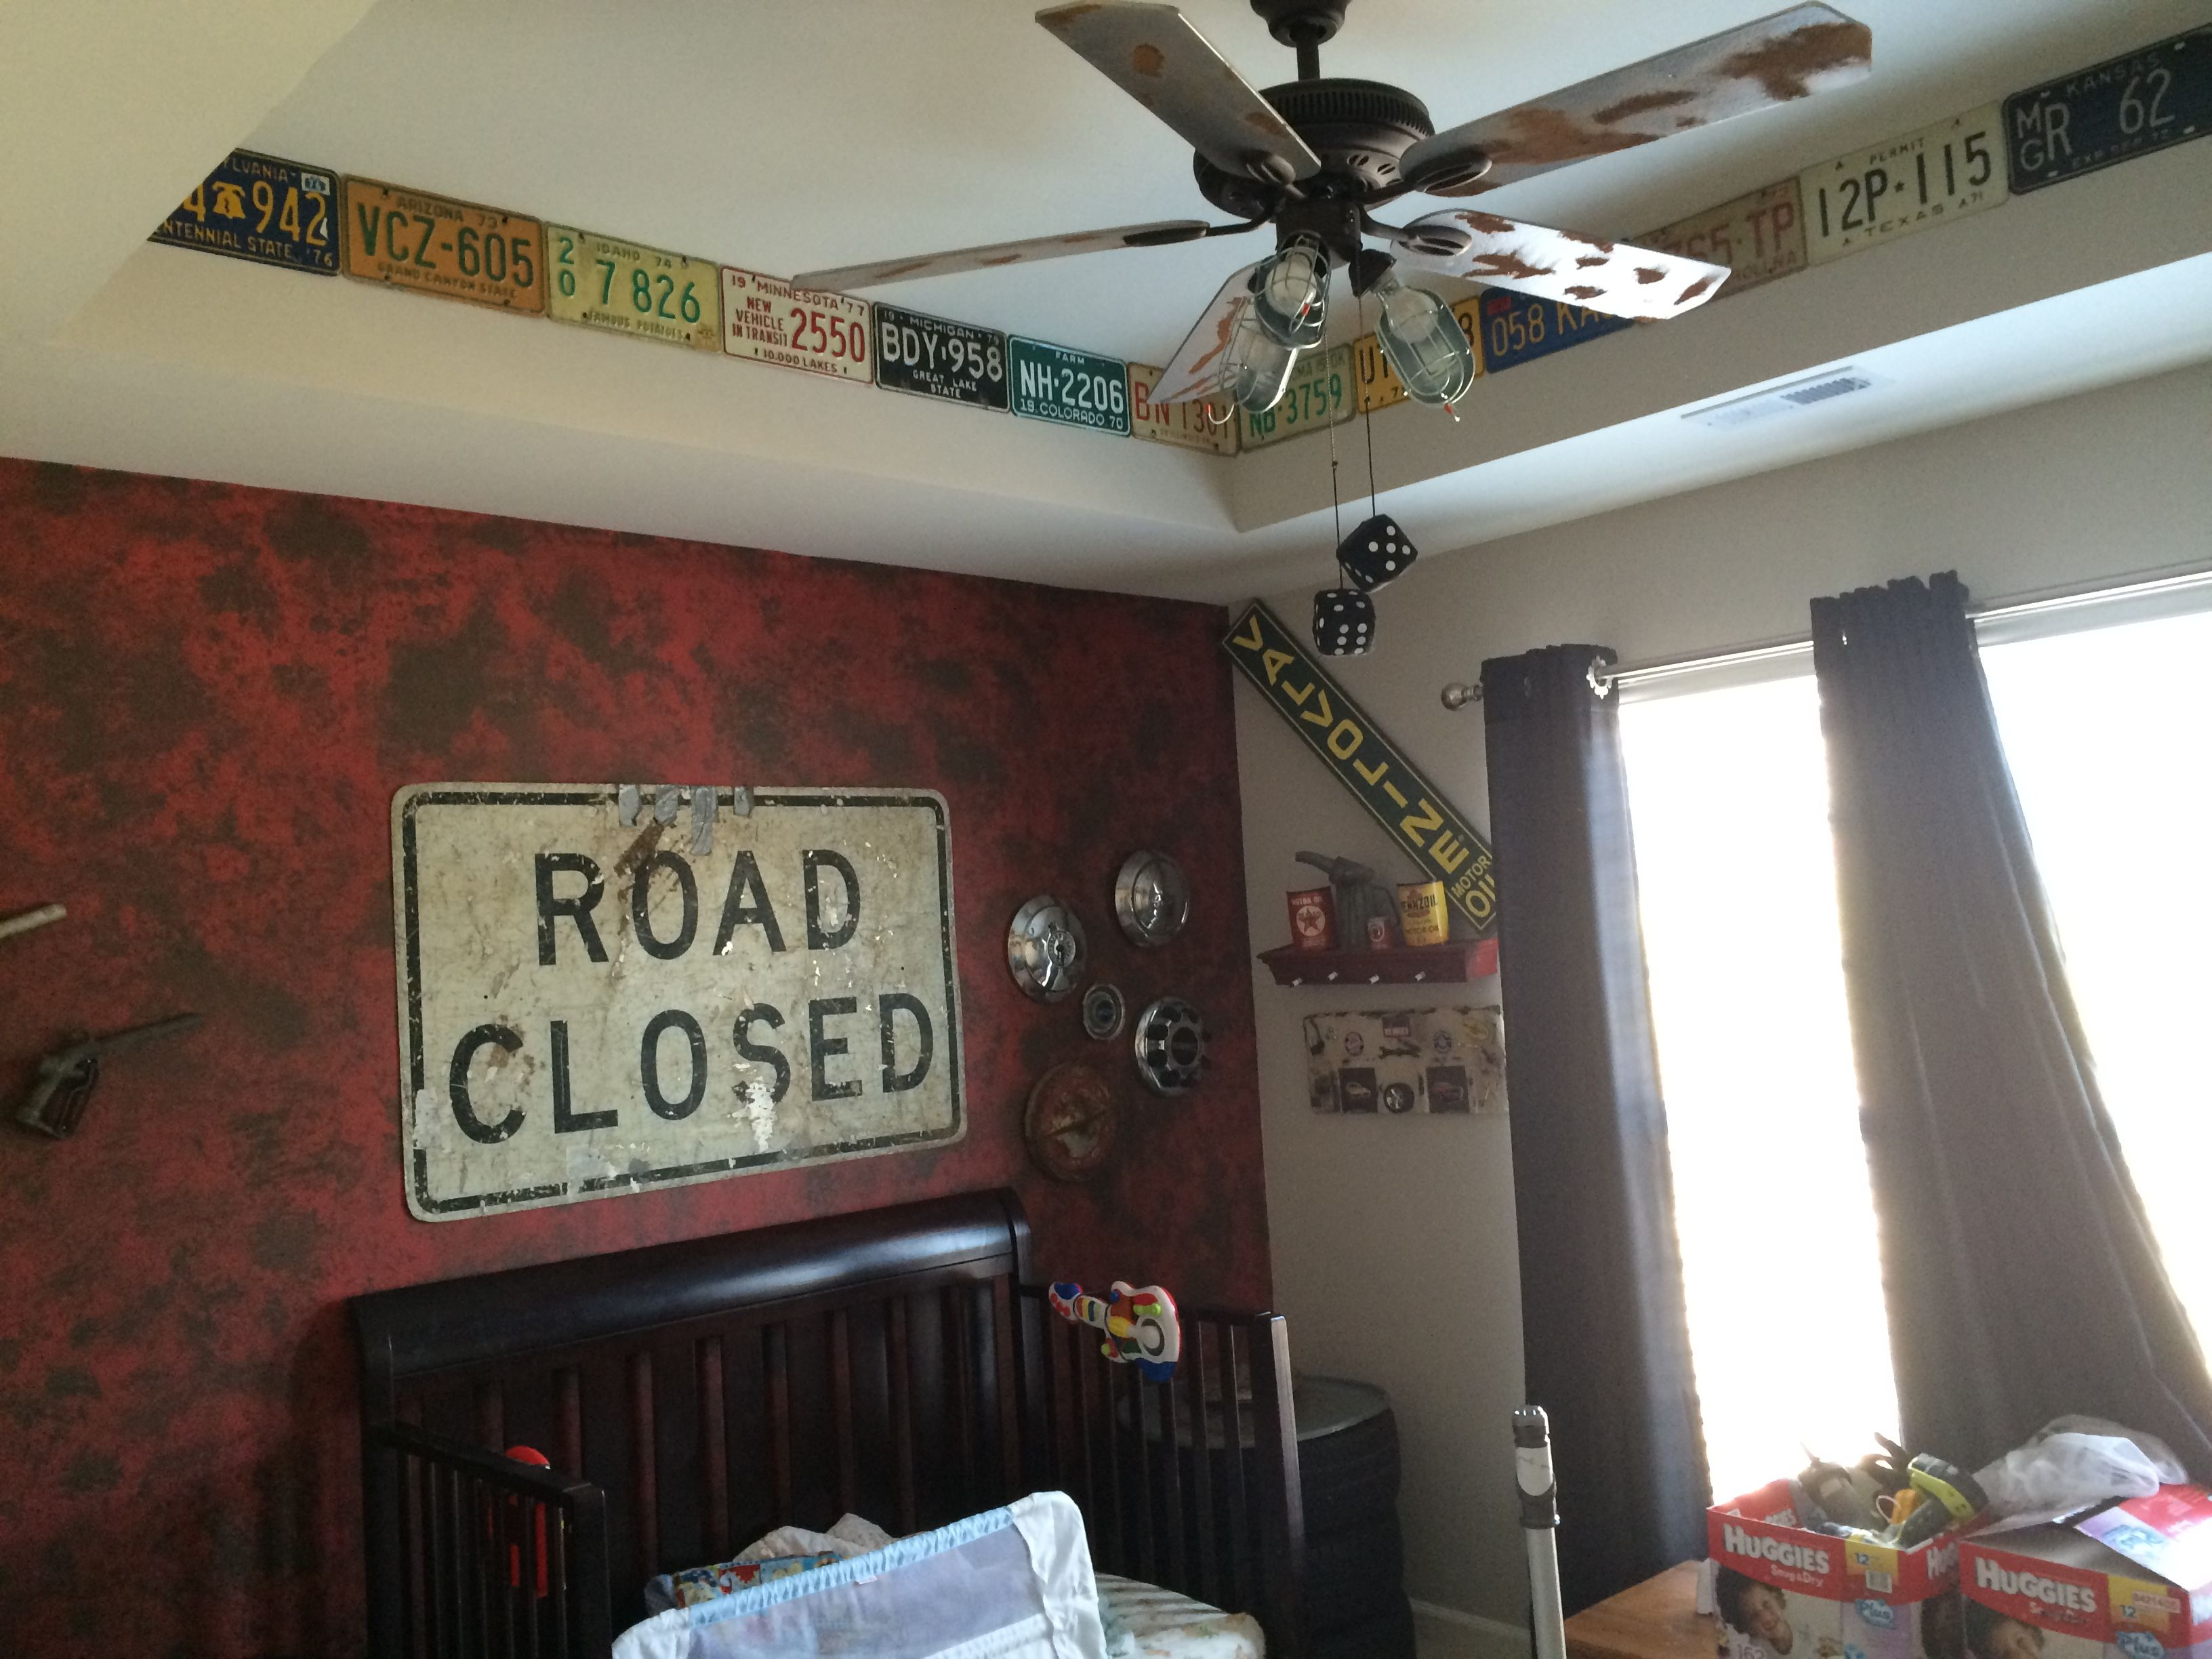 Man Cave Decor Store : Vintage car and truck decor decorations man cave boys room